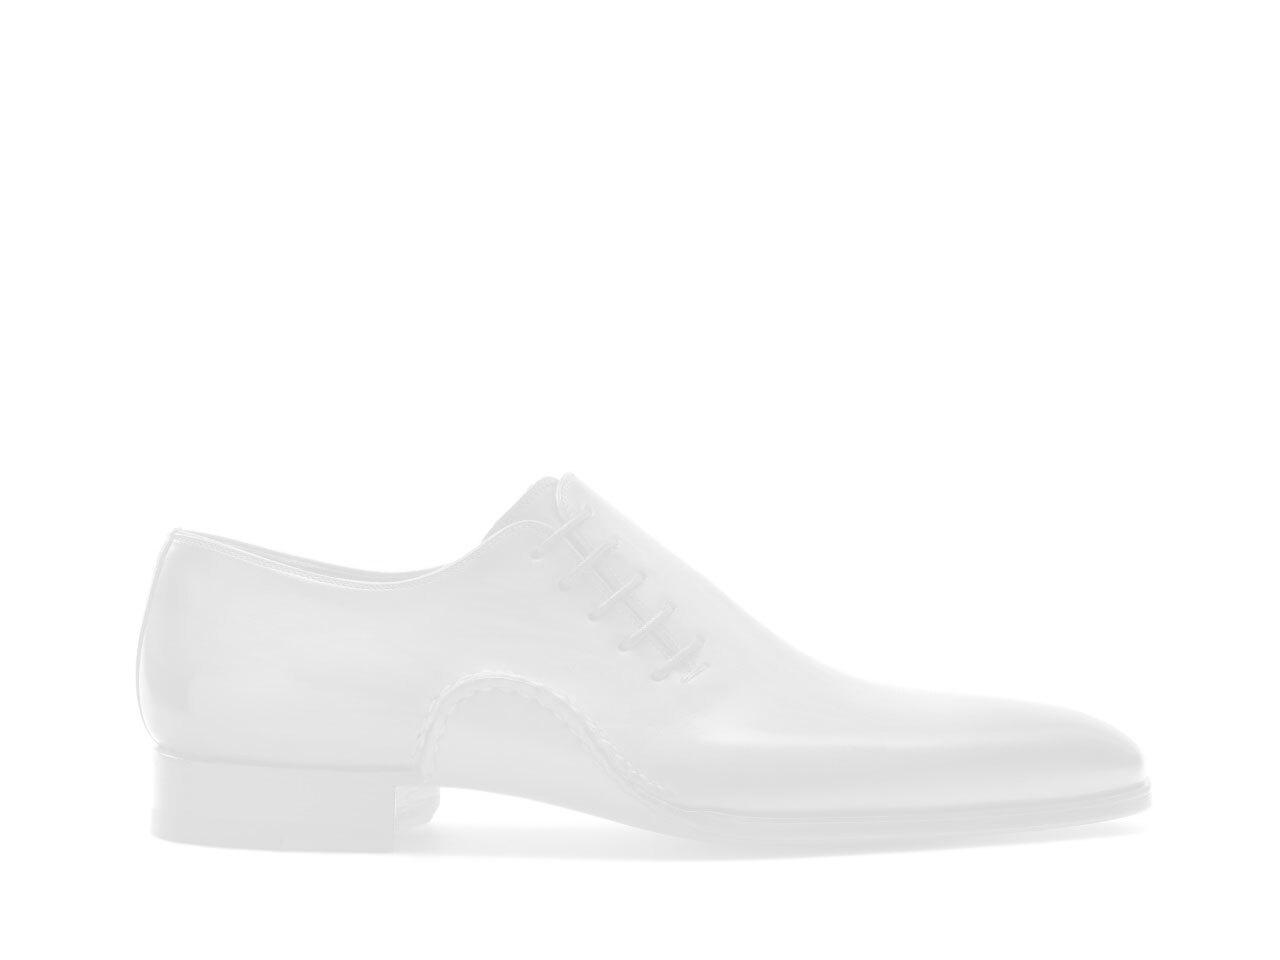 Pair of the Magnanni Ibiza Grey Men's Sneakers